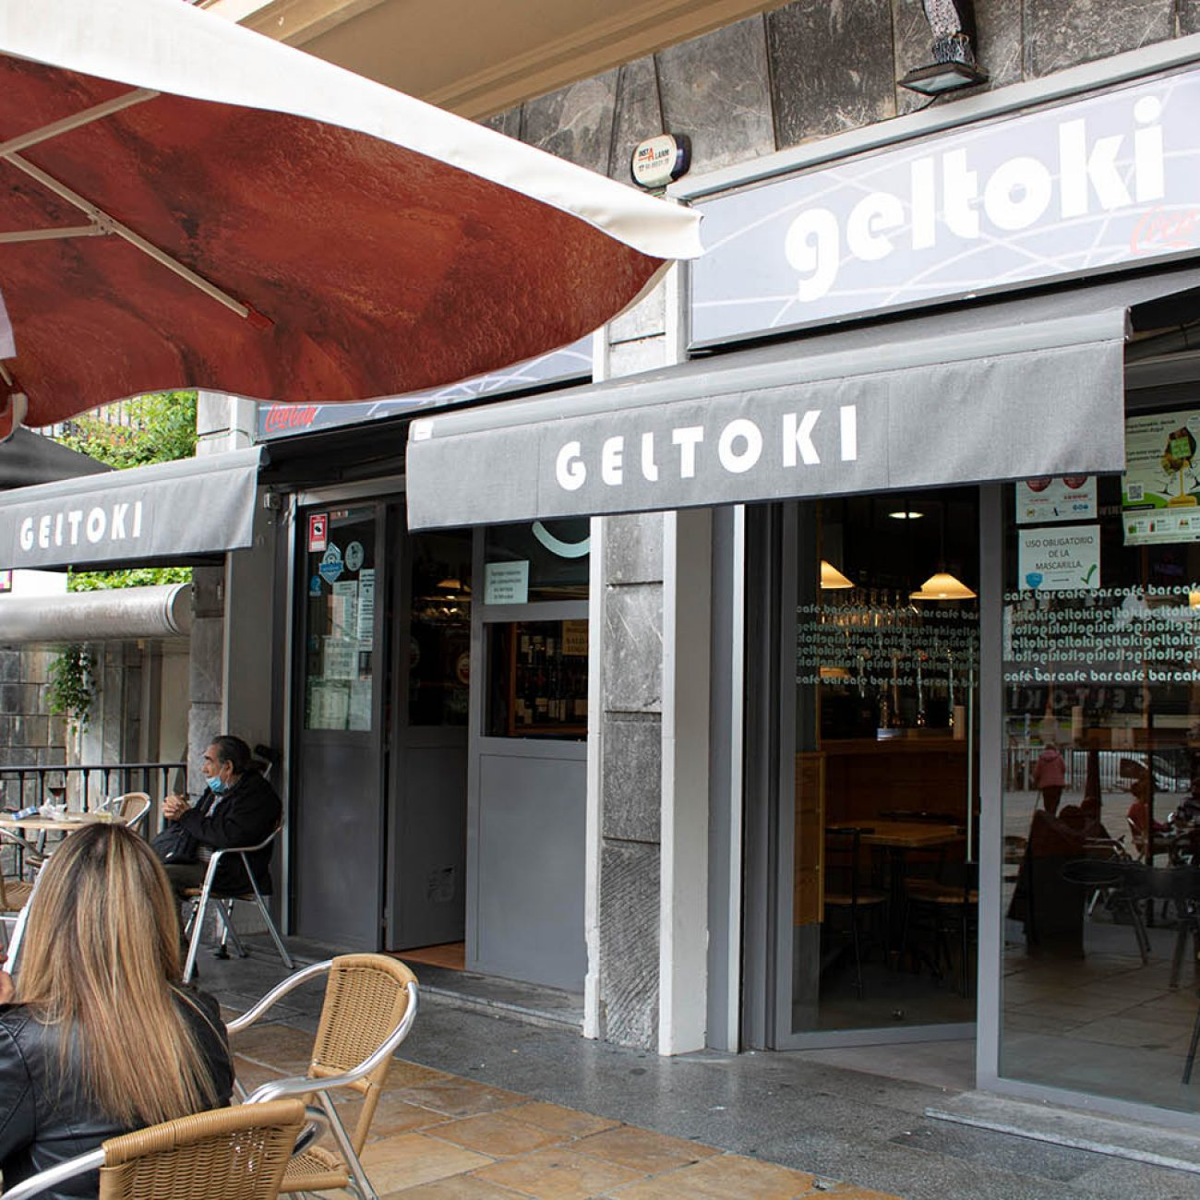 Geltoki en Bilbao